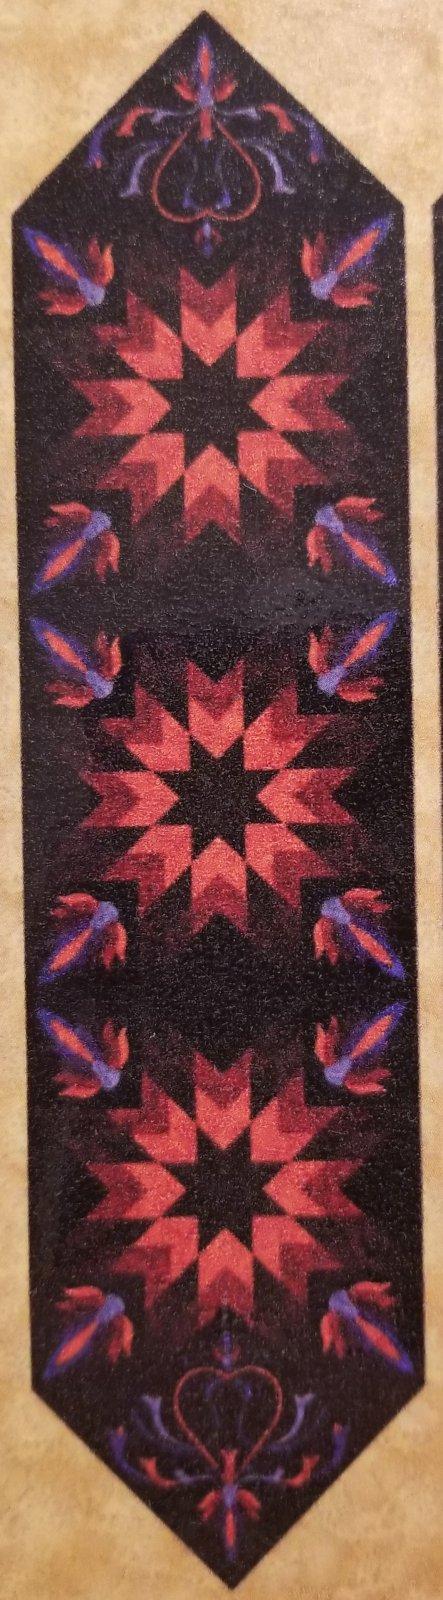 Lotus Table Runner (Henna) - Pattern